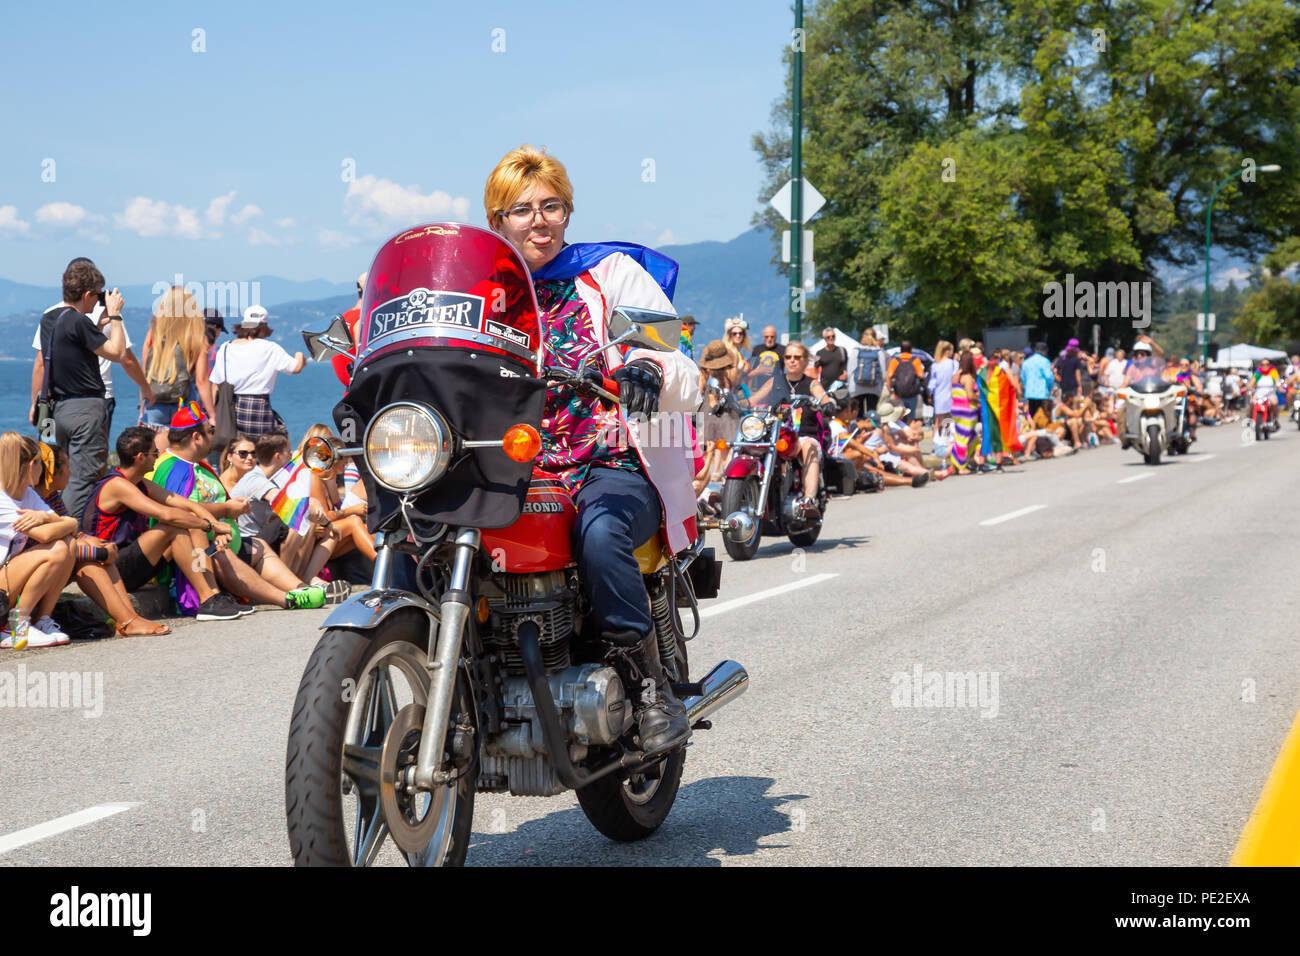 Classic homosexual cop and biker